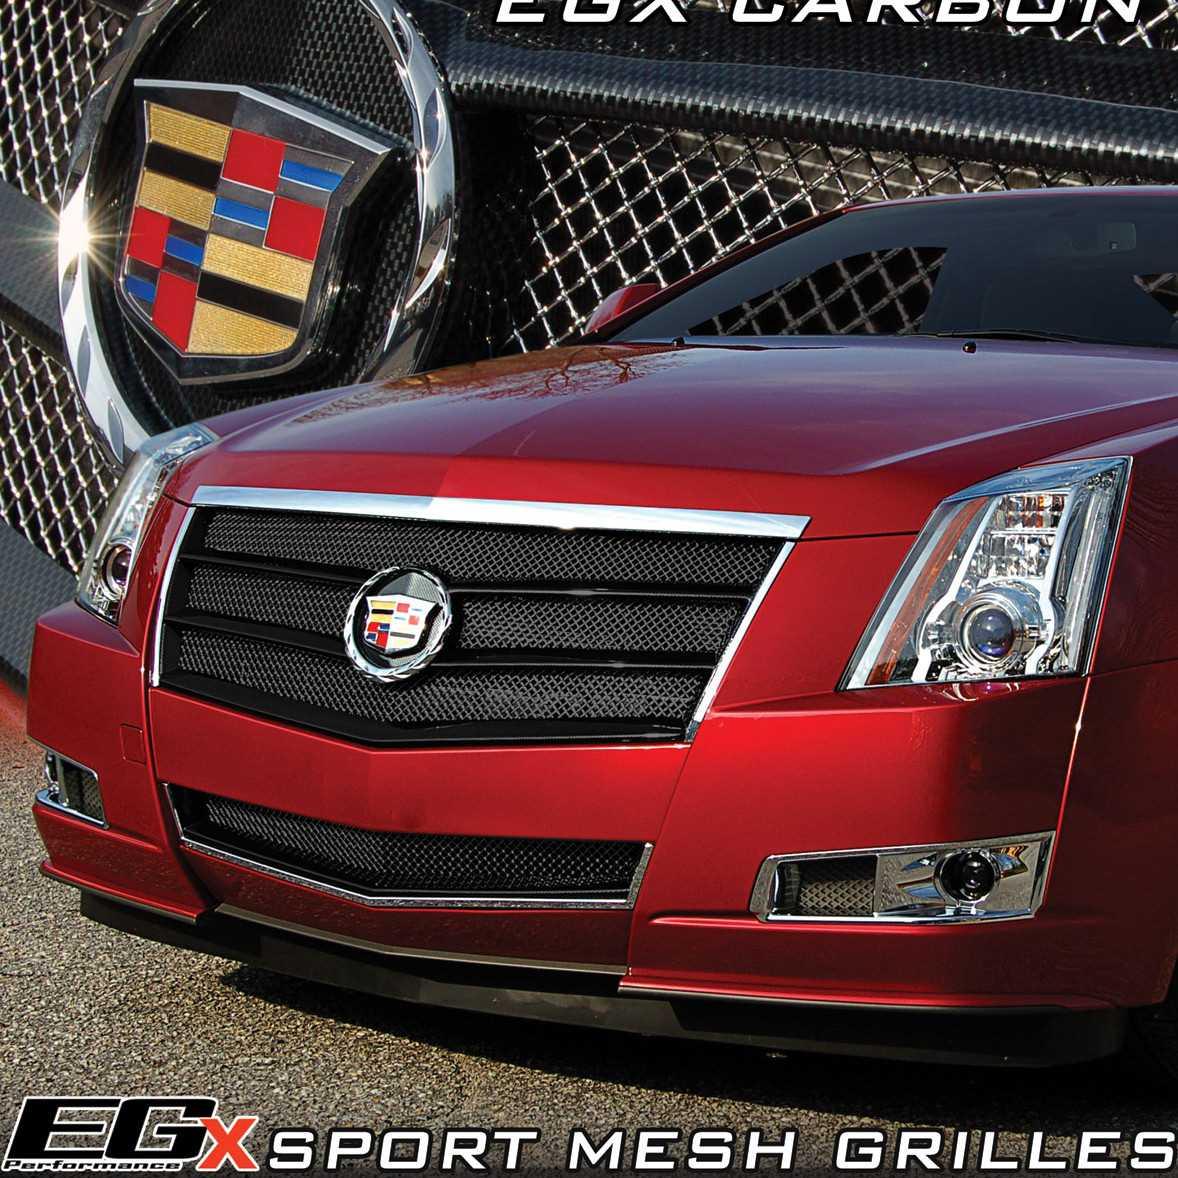 E&G Classics 2008-2013 Cadillac CTS Grille 2Pc Egx Sport